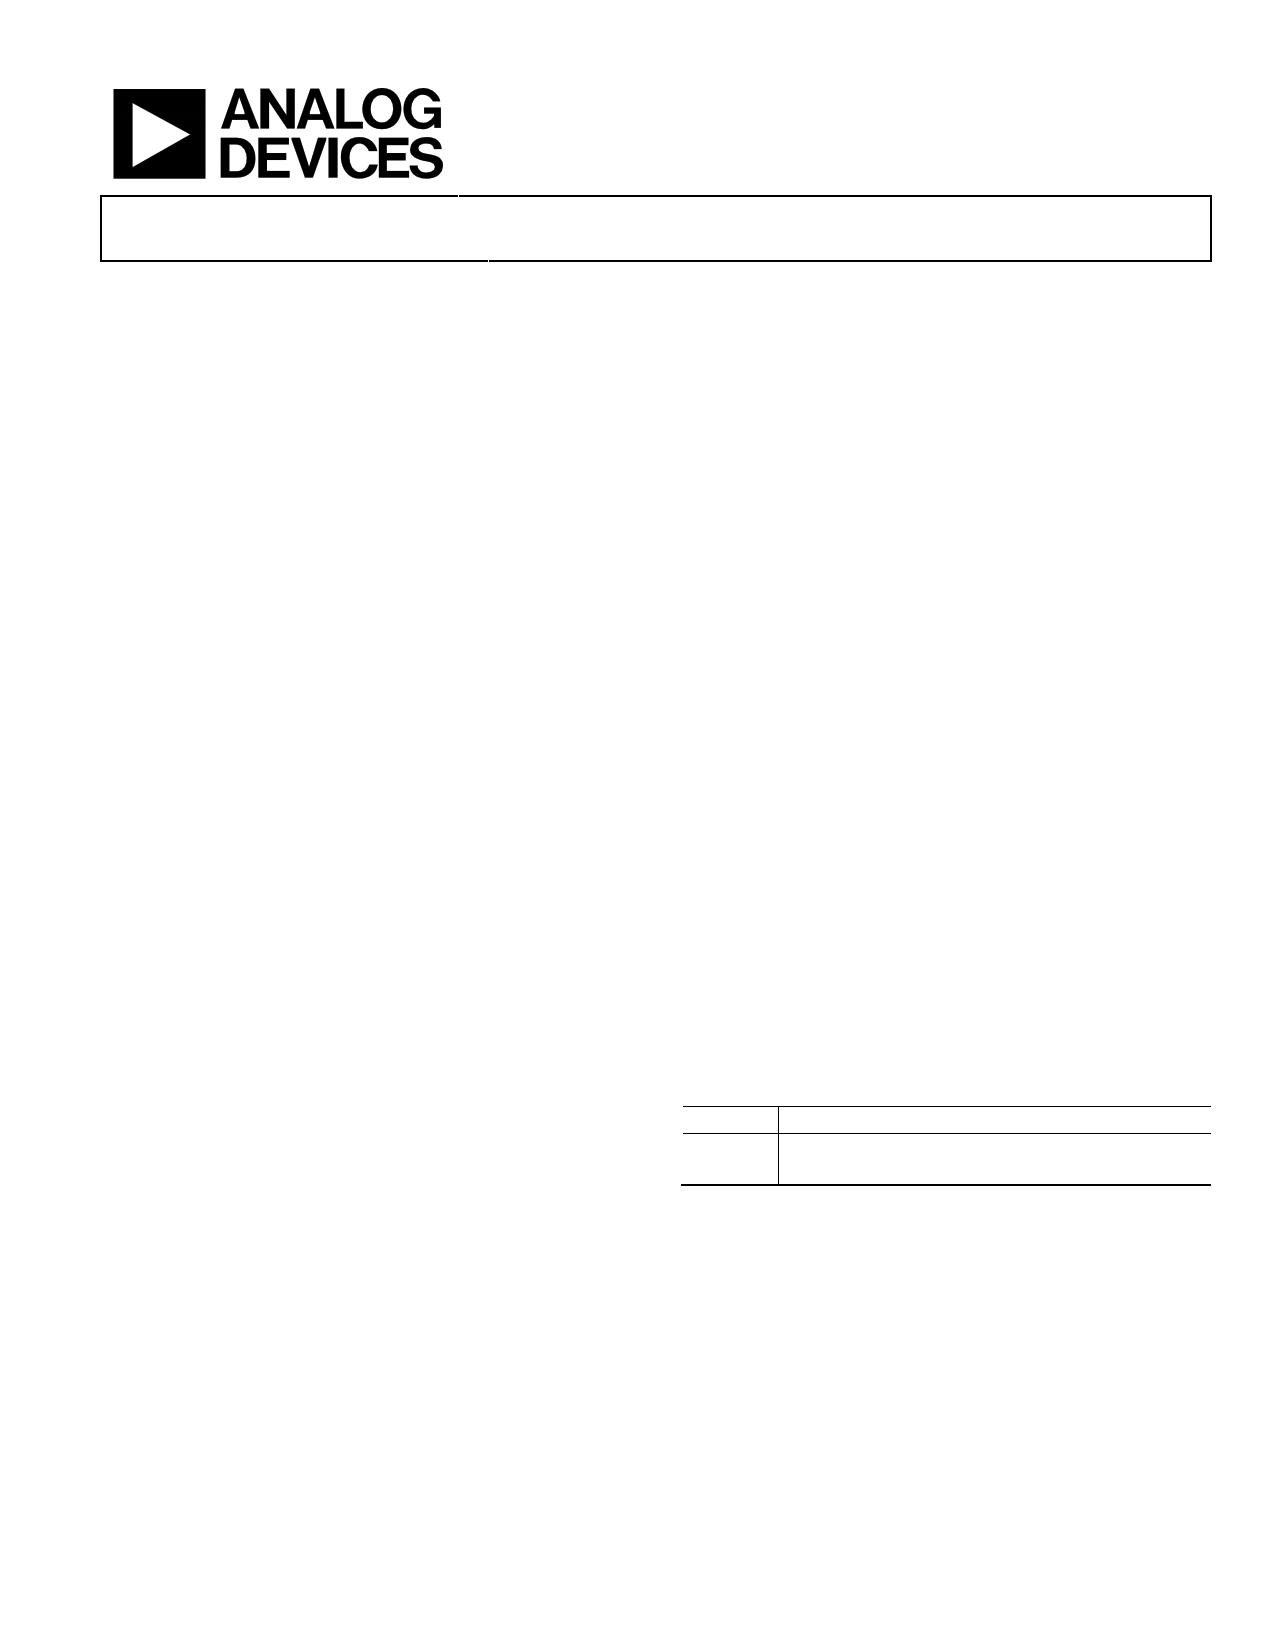 AD5412 datasheet